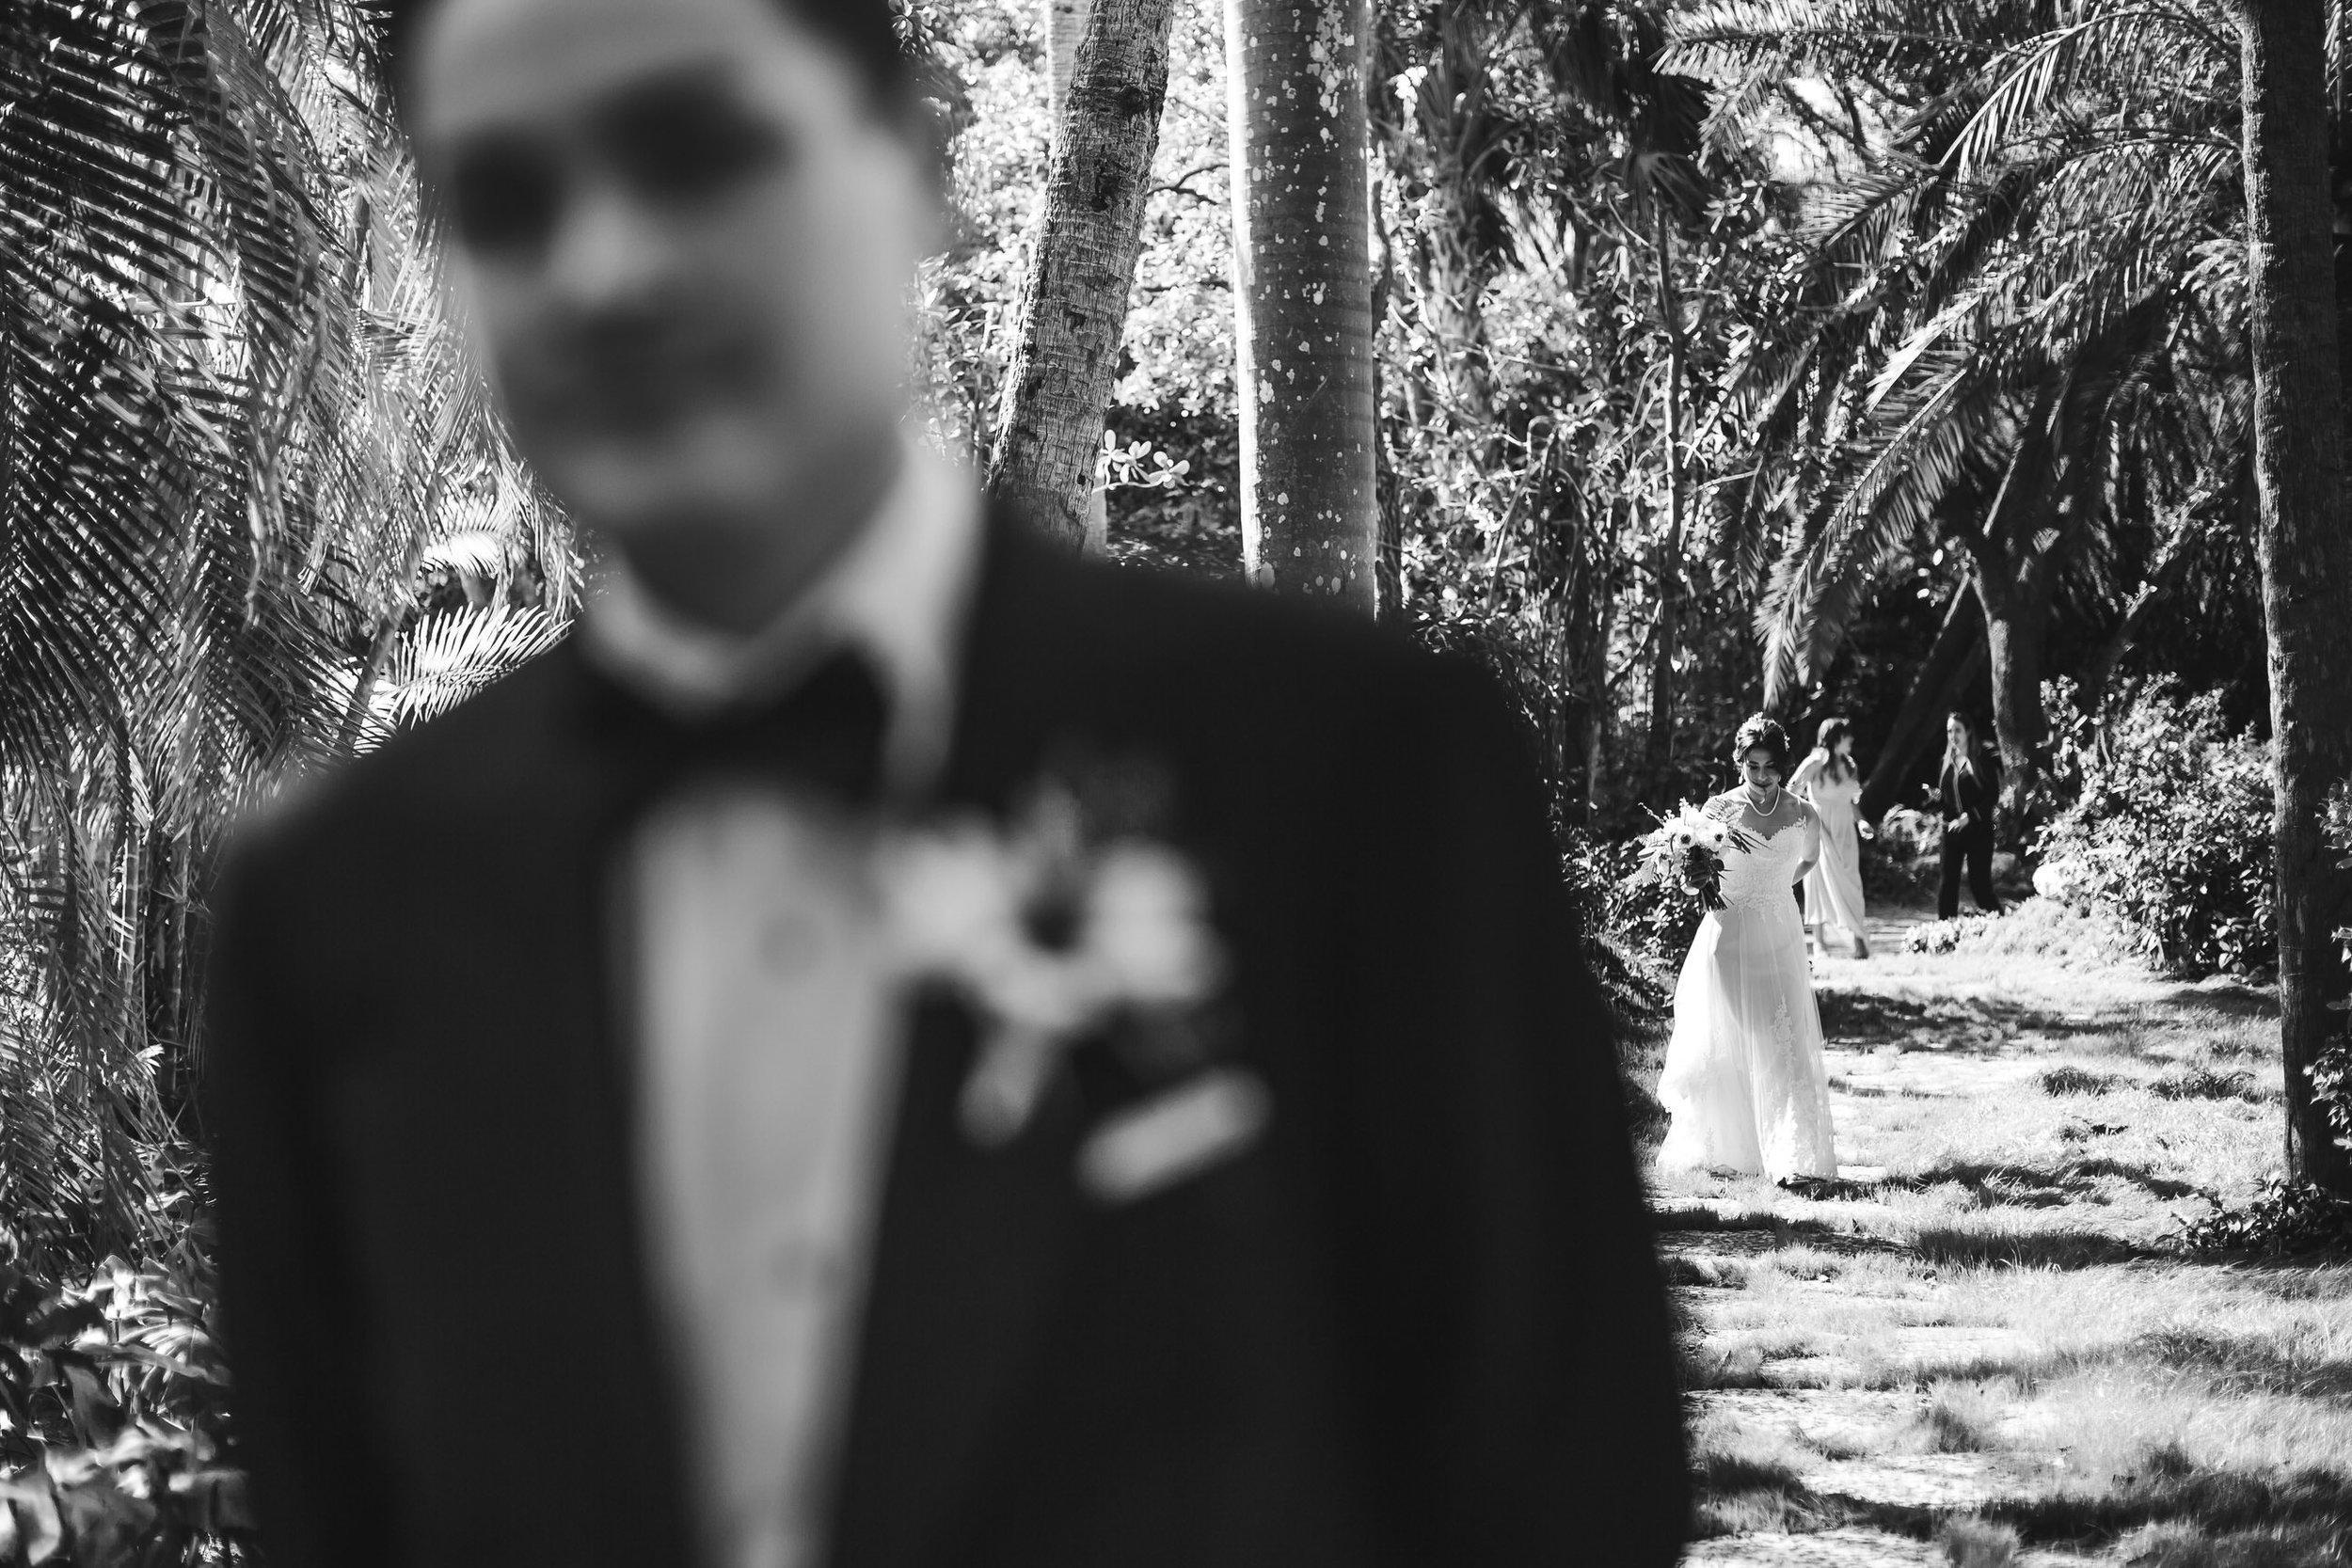 first_look_bride_groom_backyard_elegant_wedding_tiny_house_photo.jpg